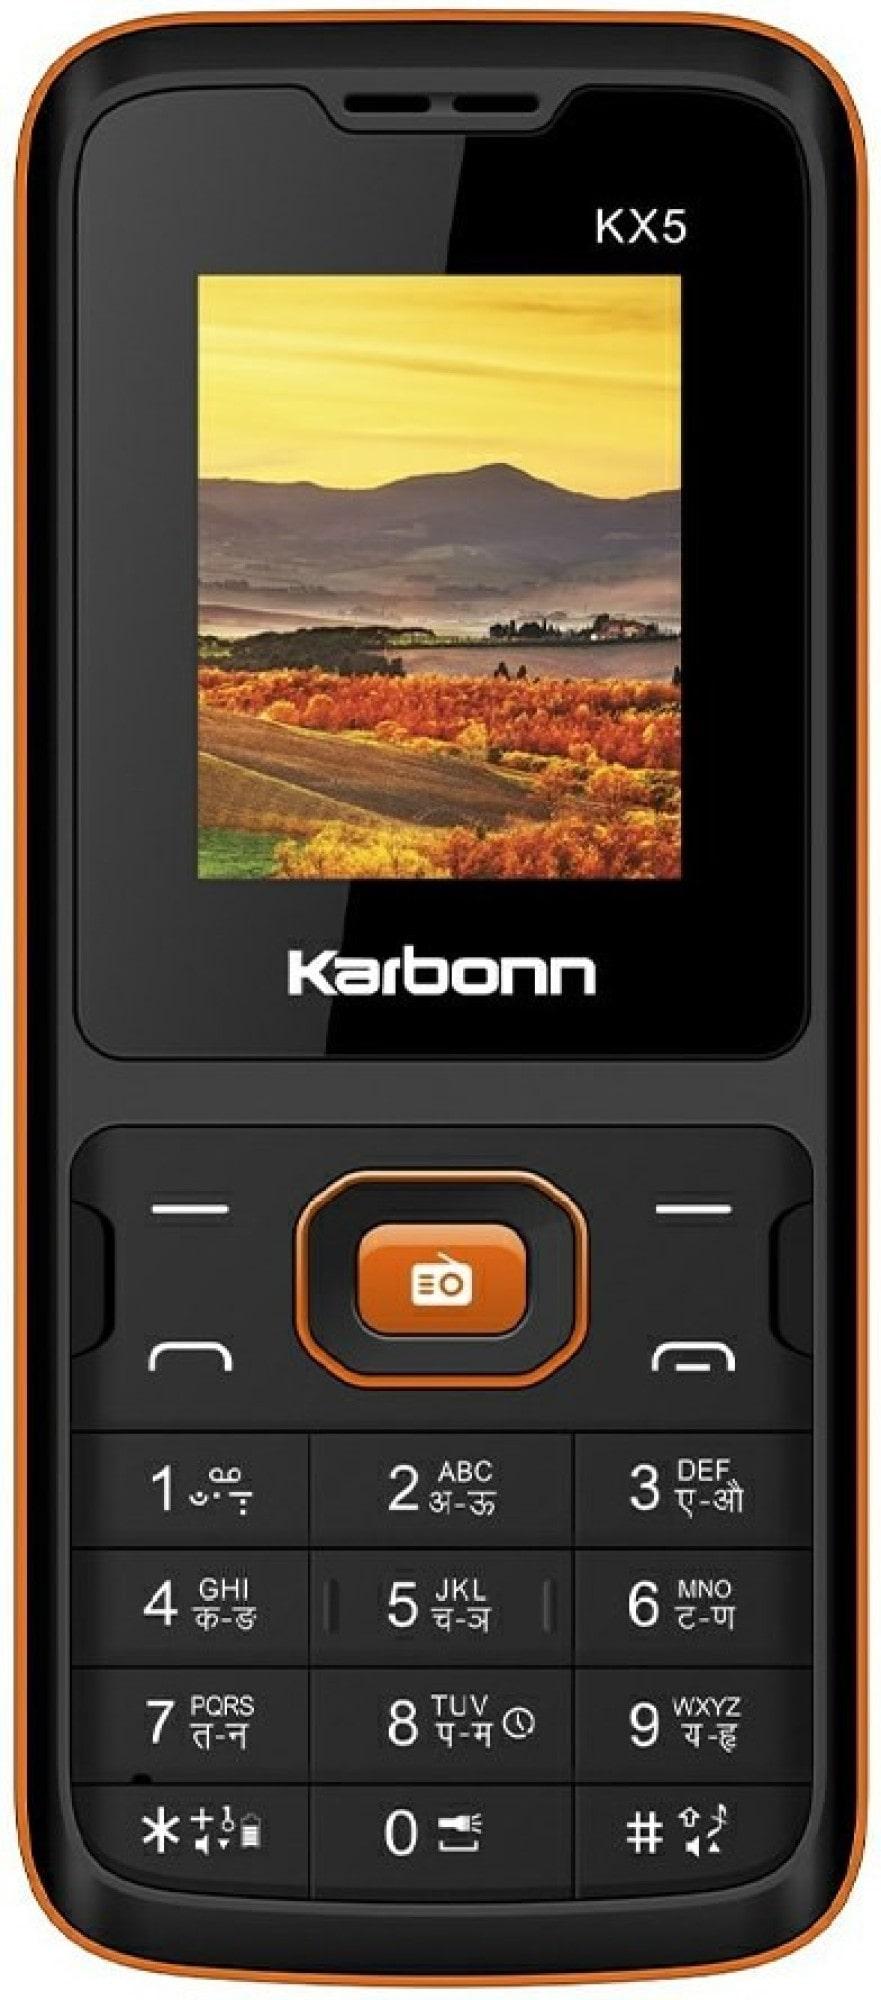 https://assetscdn1.paytm.com/images/catalog/product/M/MO/MOBKARBONN-KX5-INDI867325510DD392/0..jpg